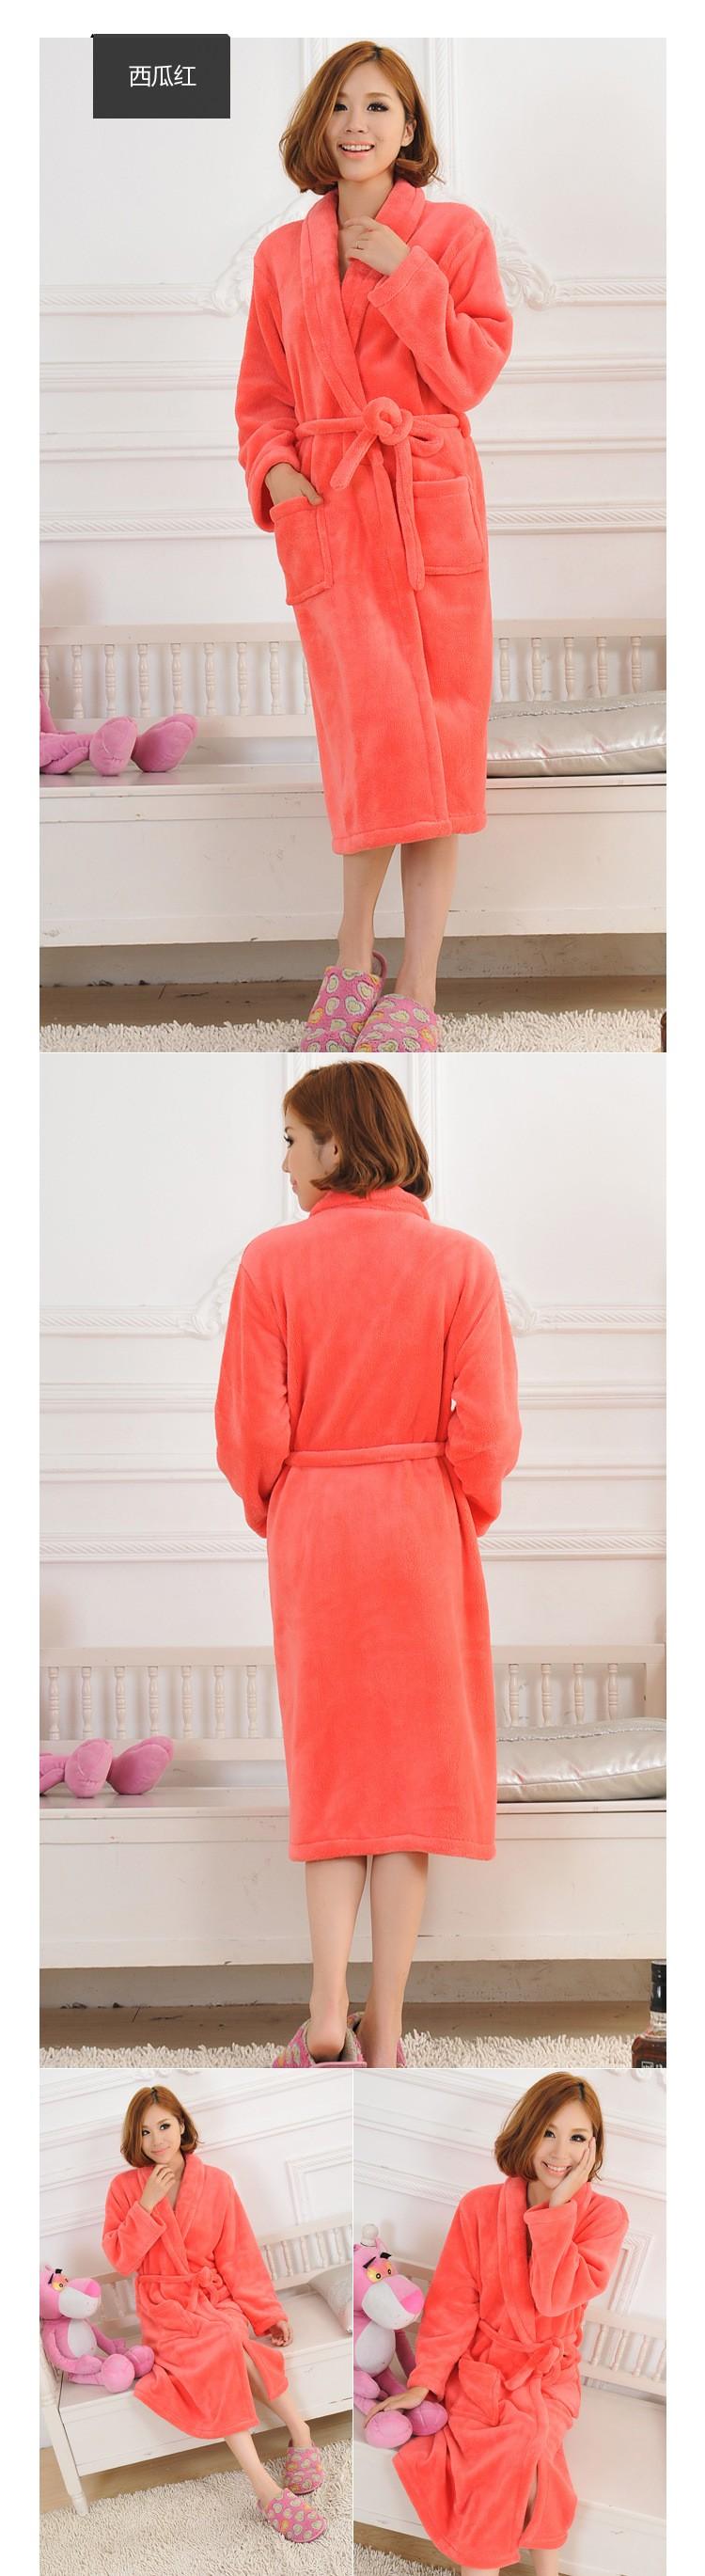 bathrobe (6)